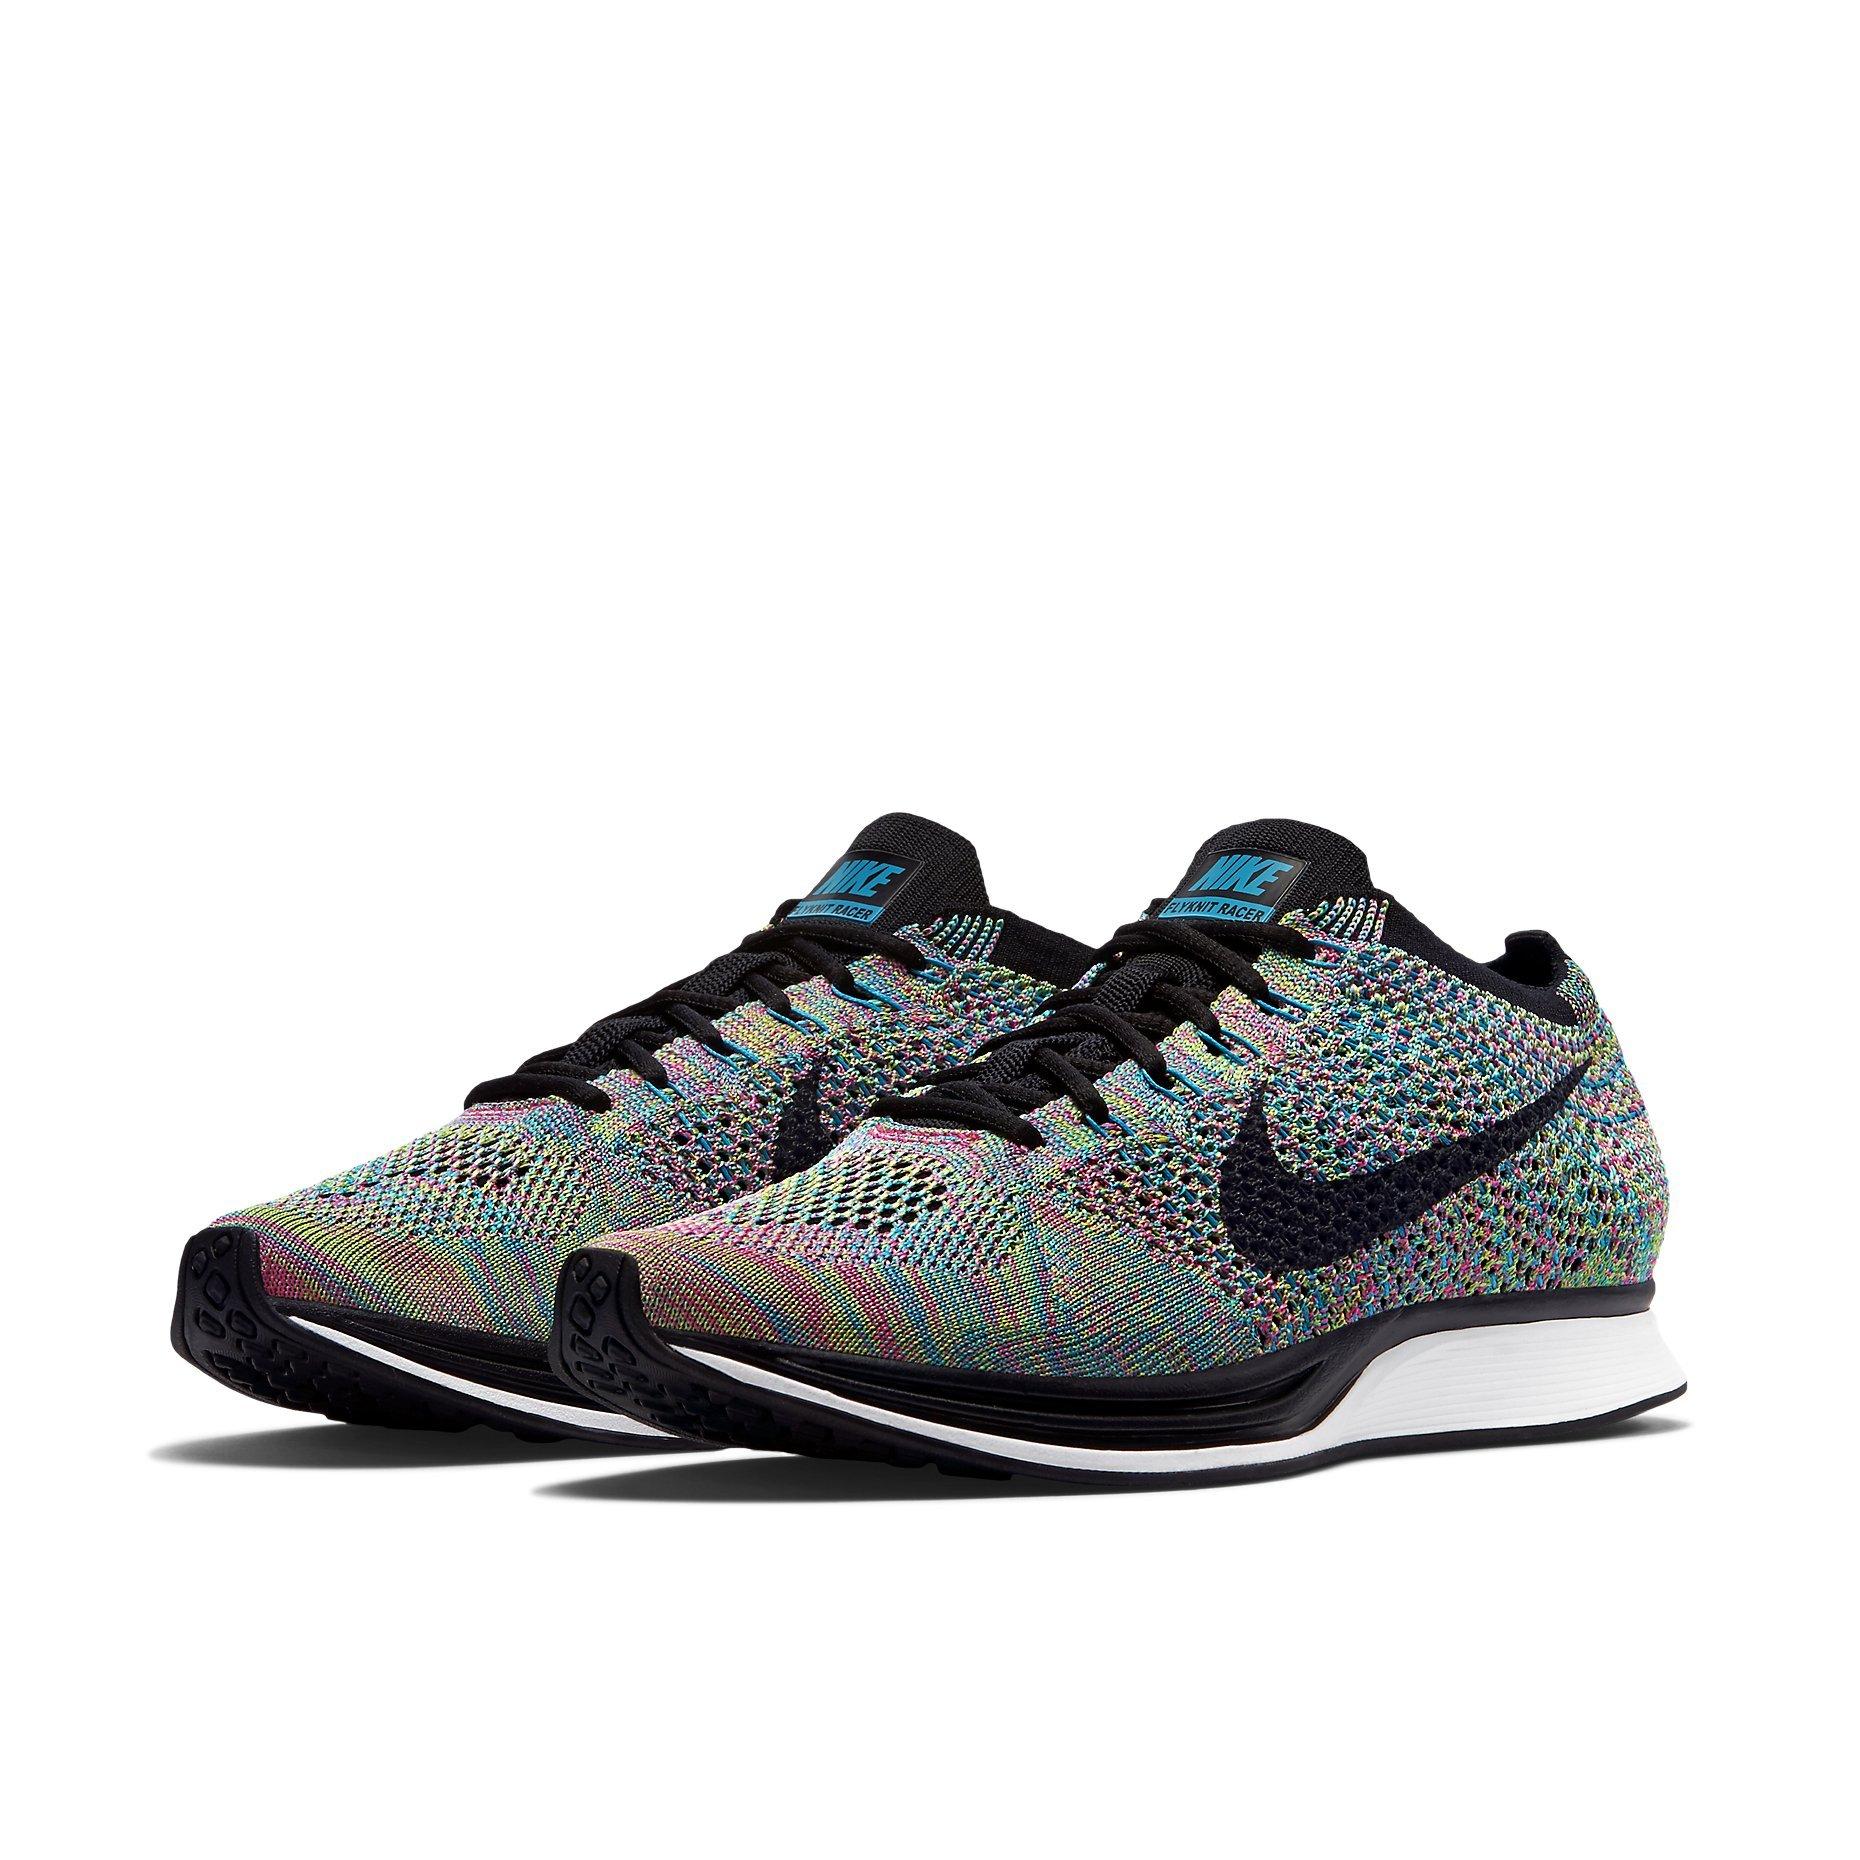 Nike Multicolor Shoes Mens